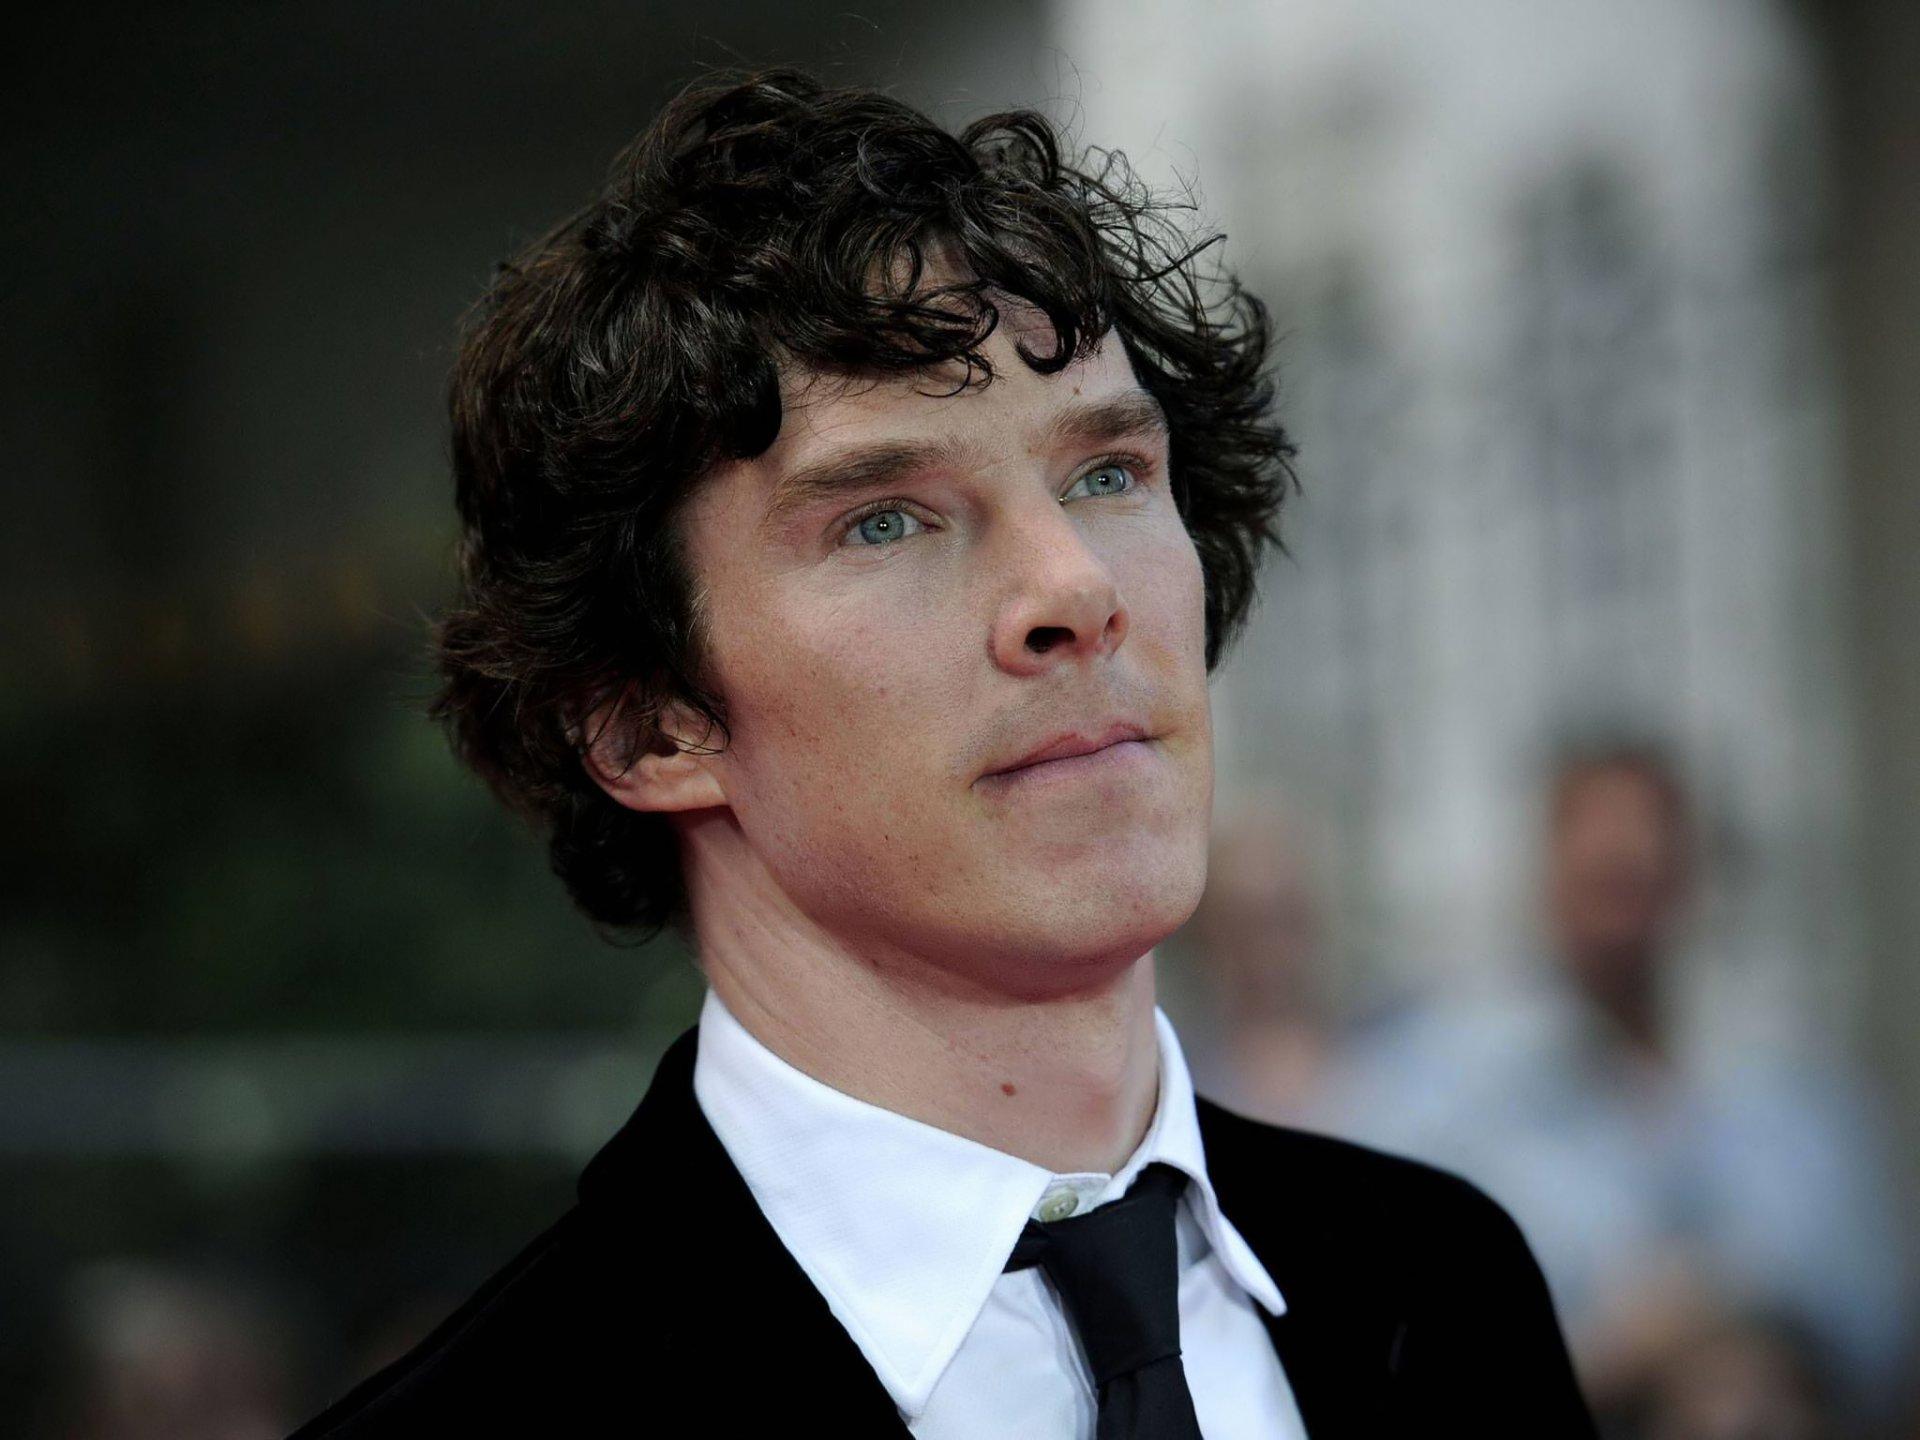 Benedict Cumberbatch Image - ID: 330460 - Image Abyss